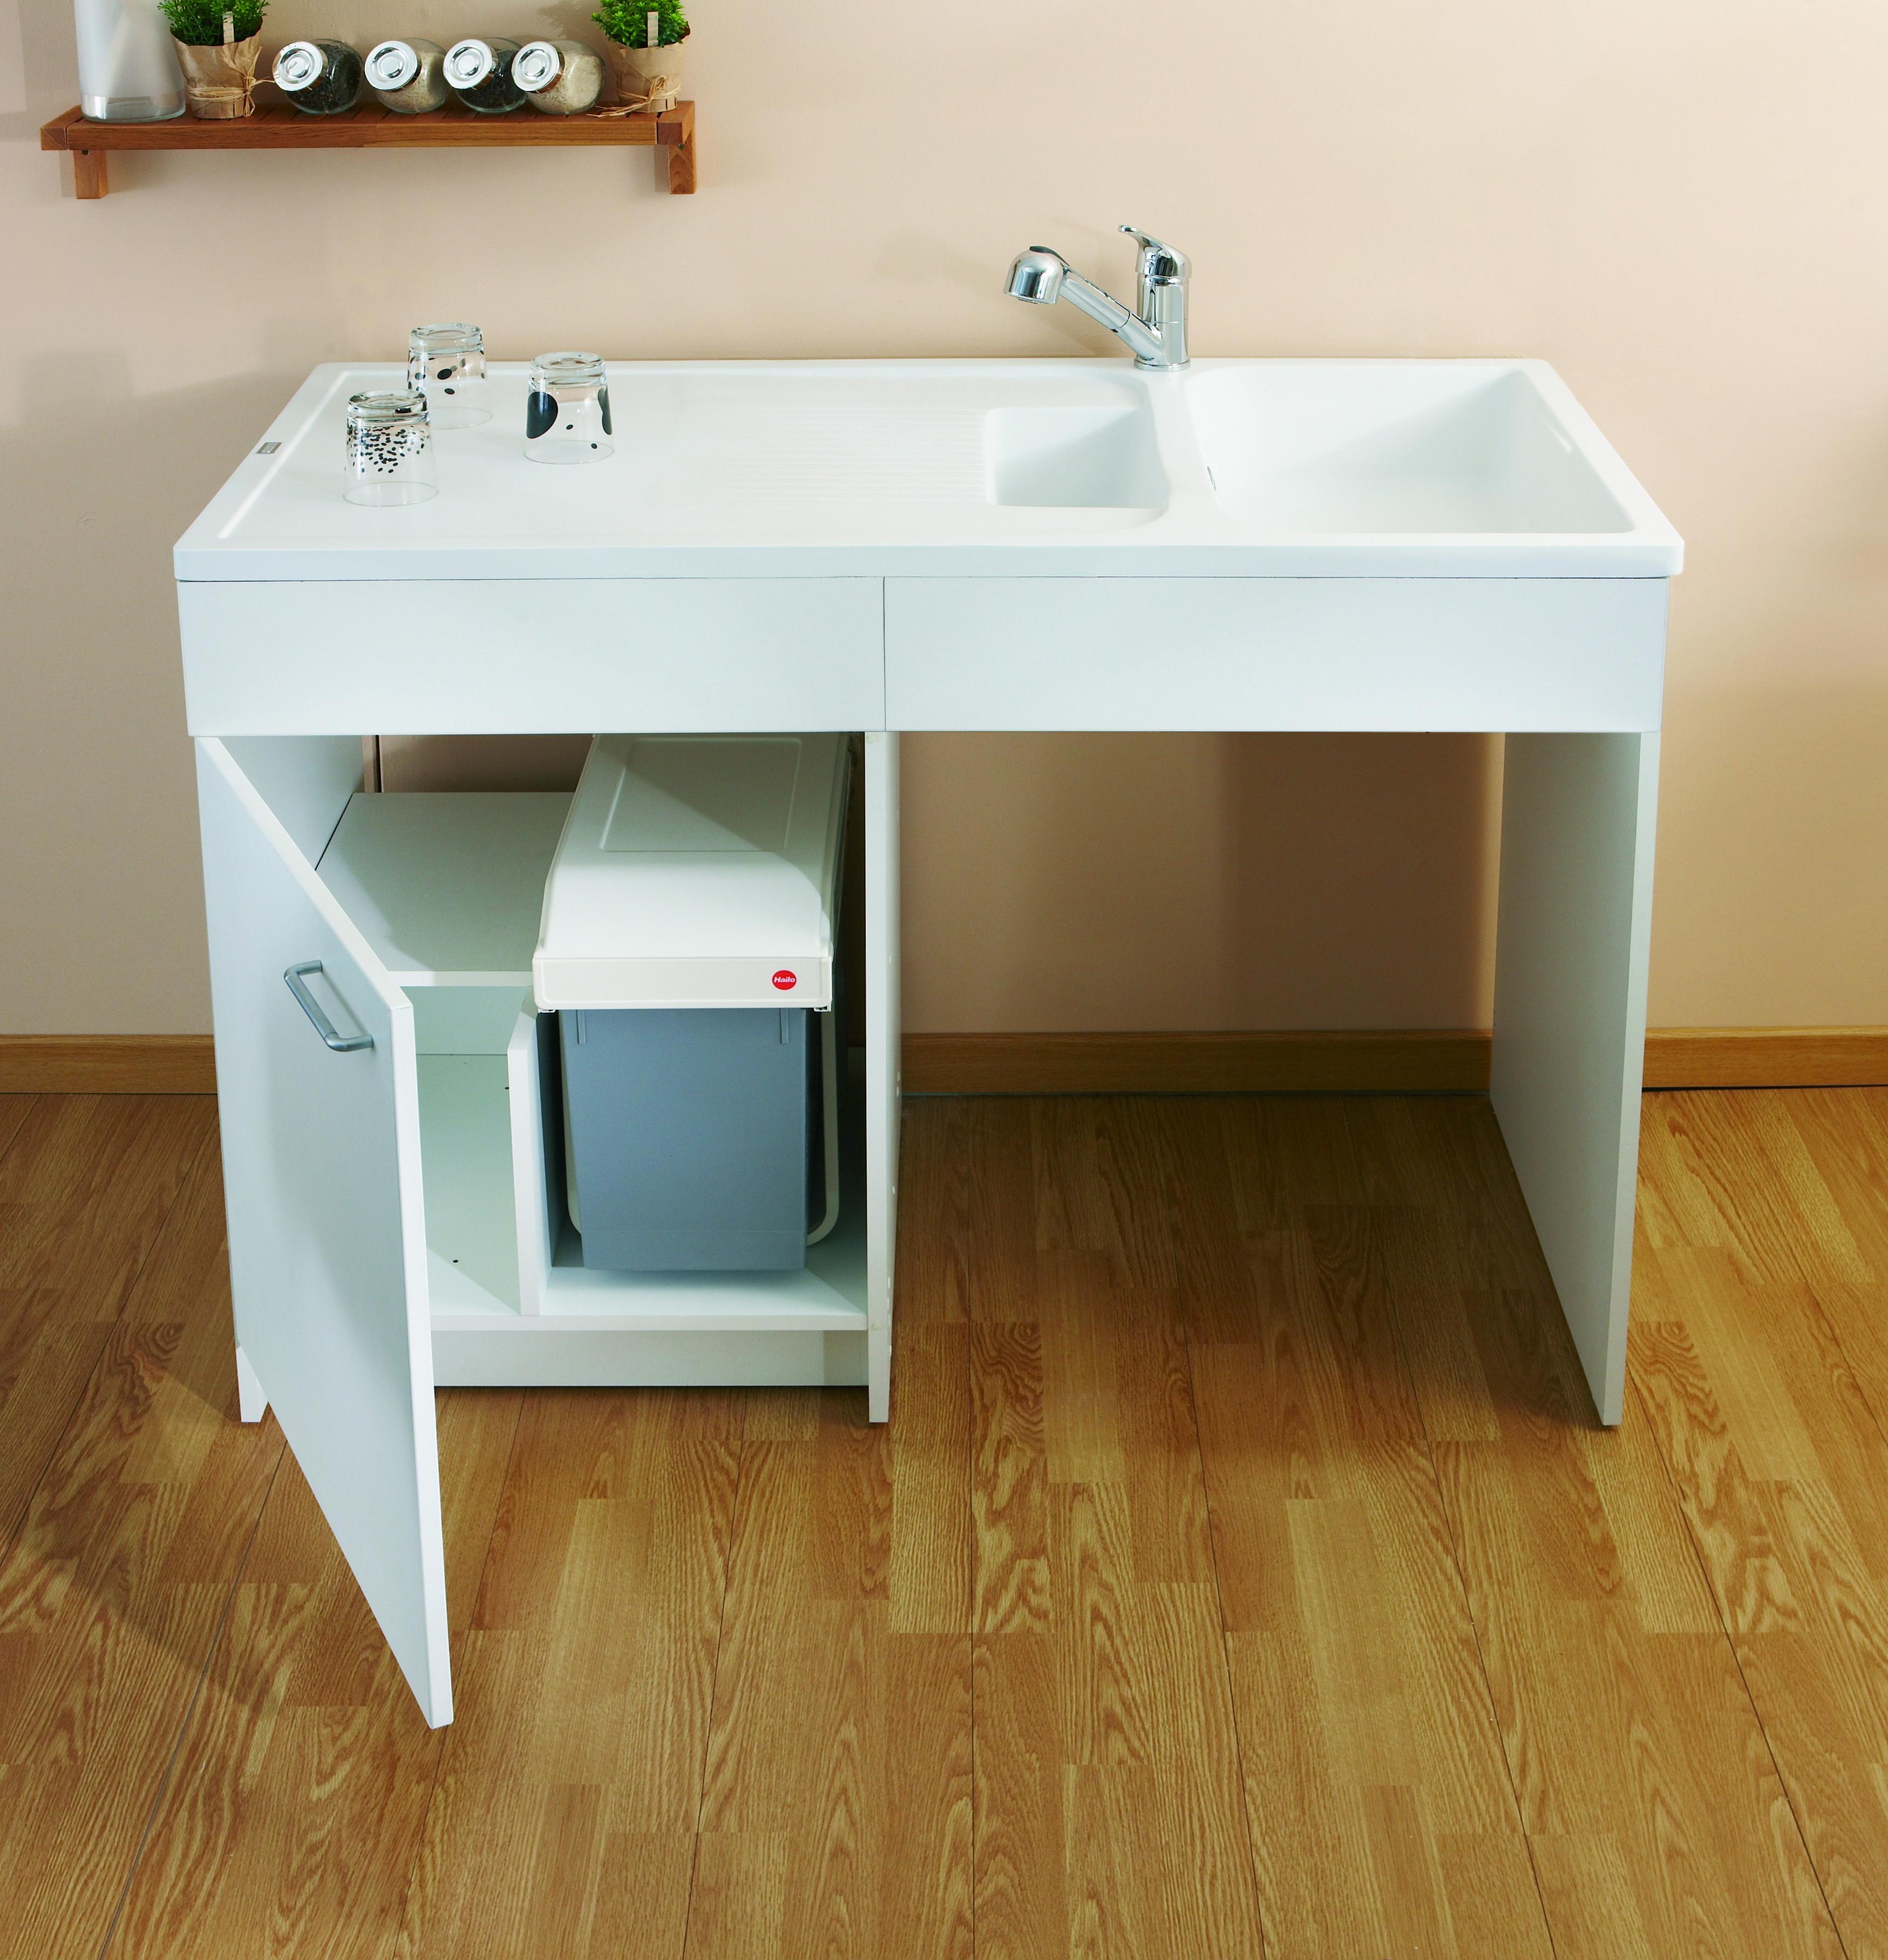 carea sanitaire concept meuble vier giga 120 senior m lamin carea sanitaire. Black Bedroom Furniture Sets. Home Design Ideas